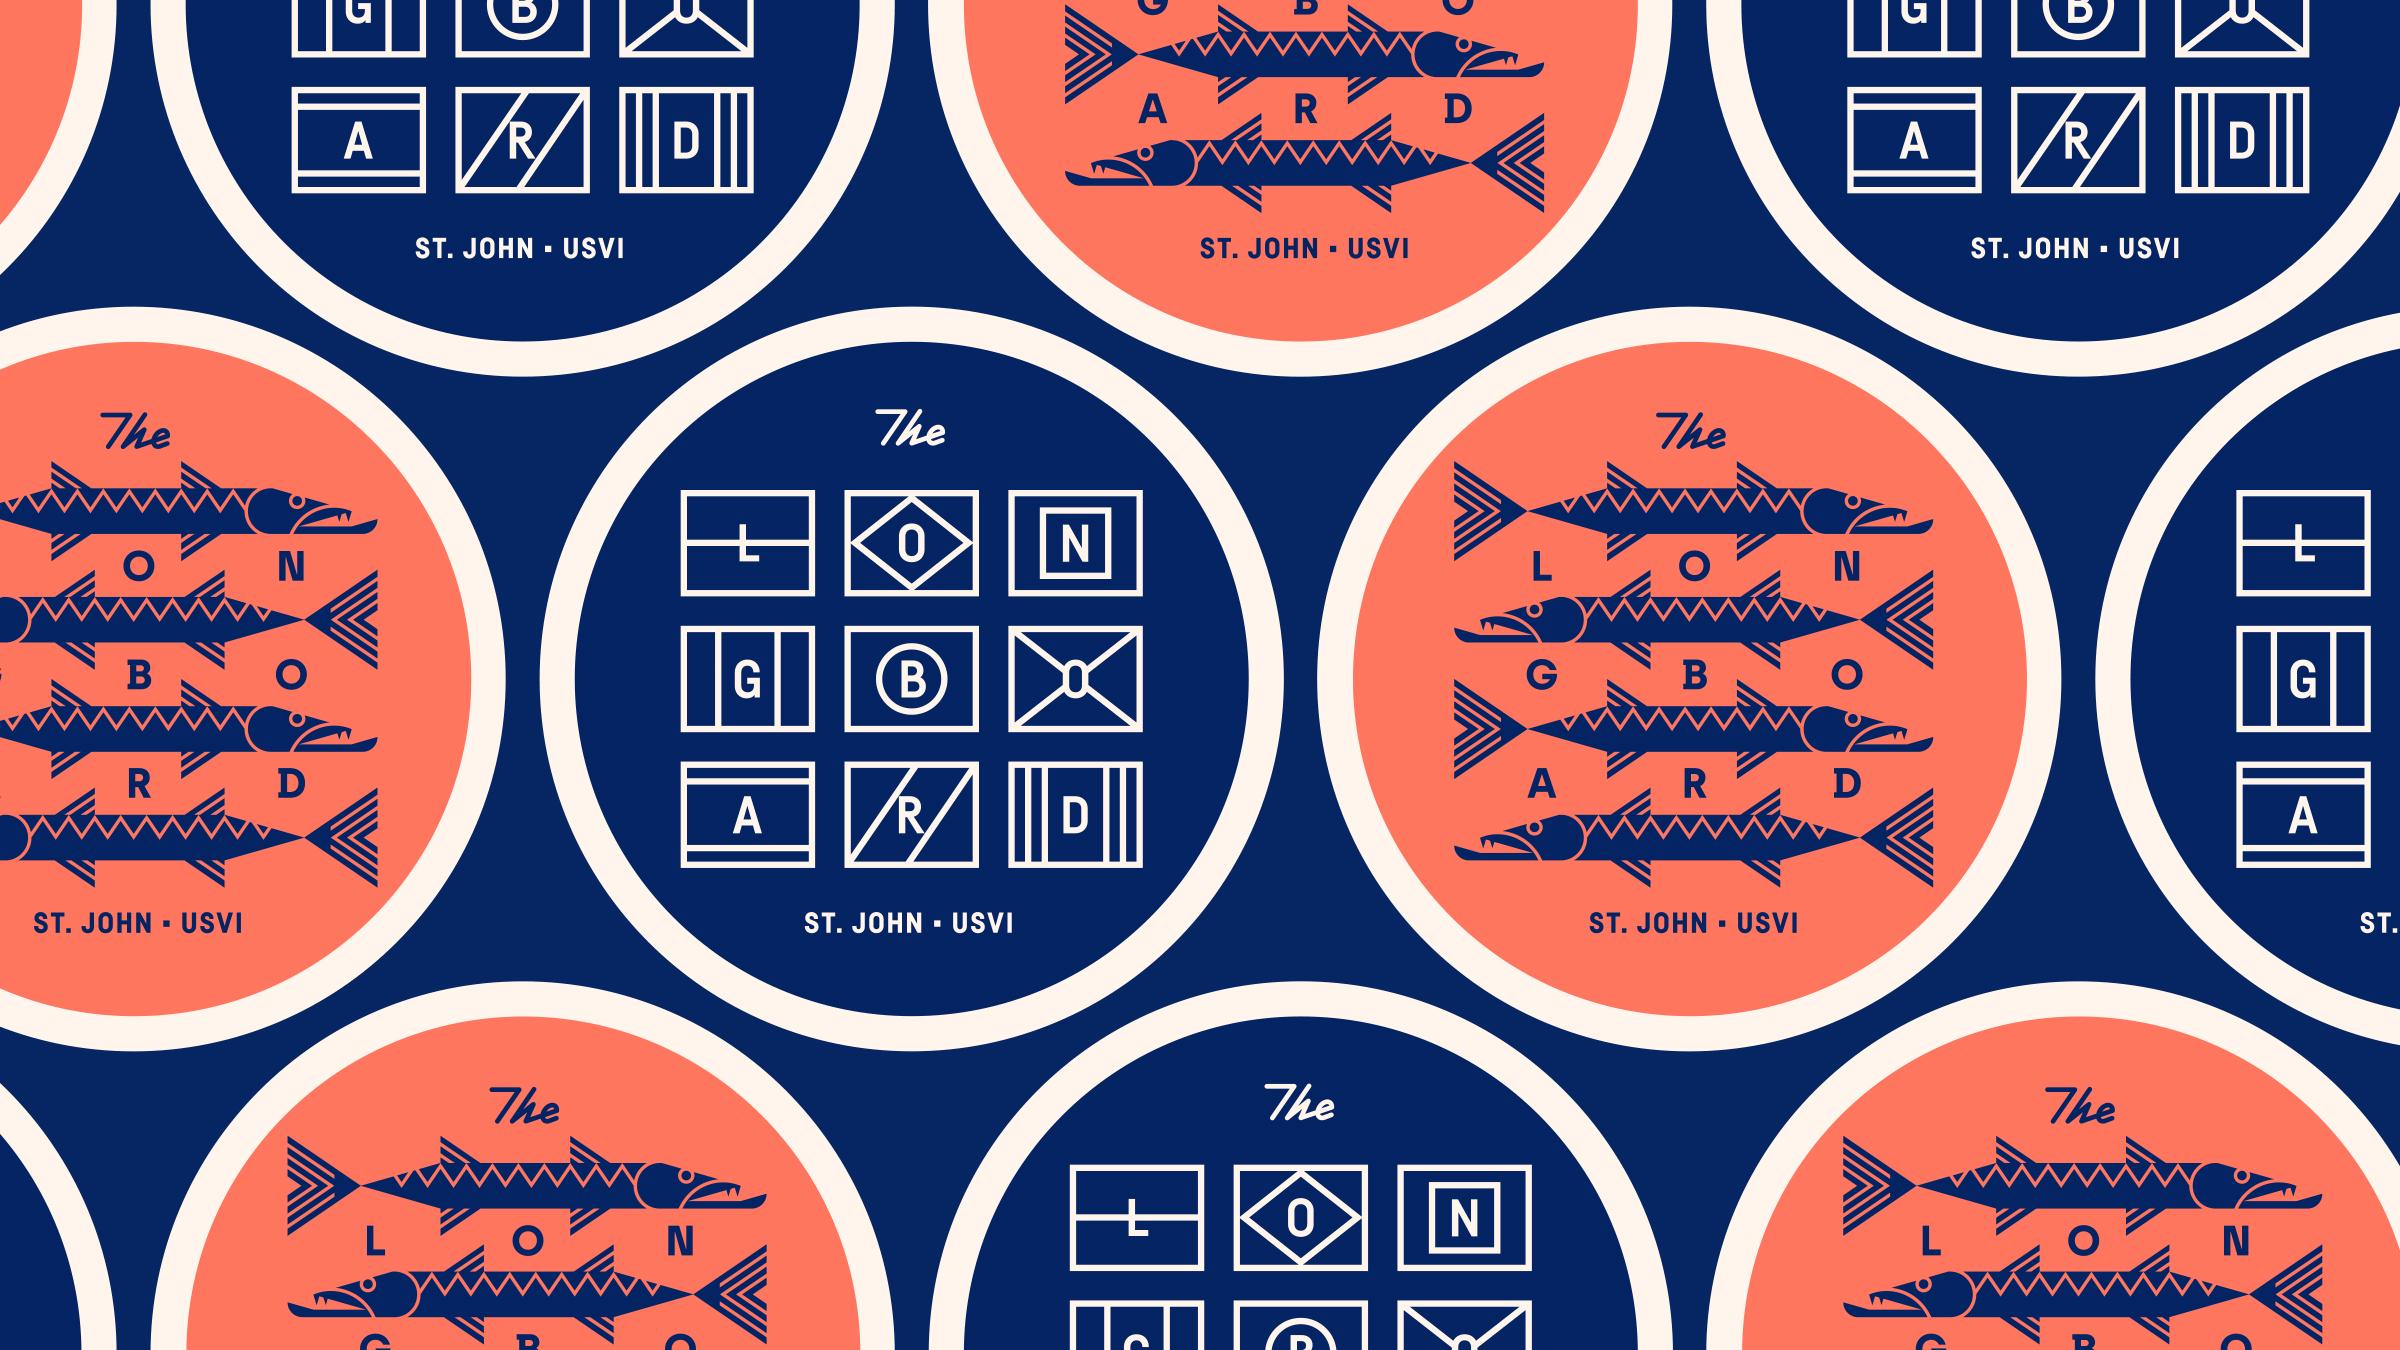 The Longboard Coasters